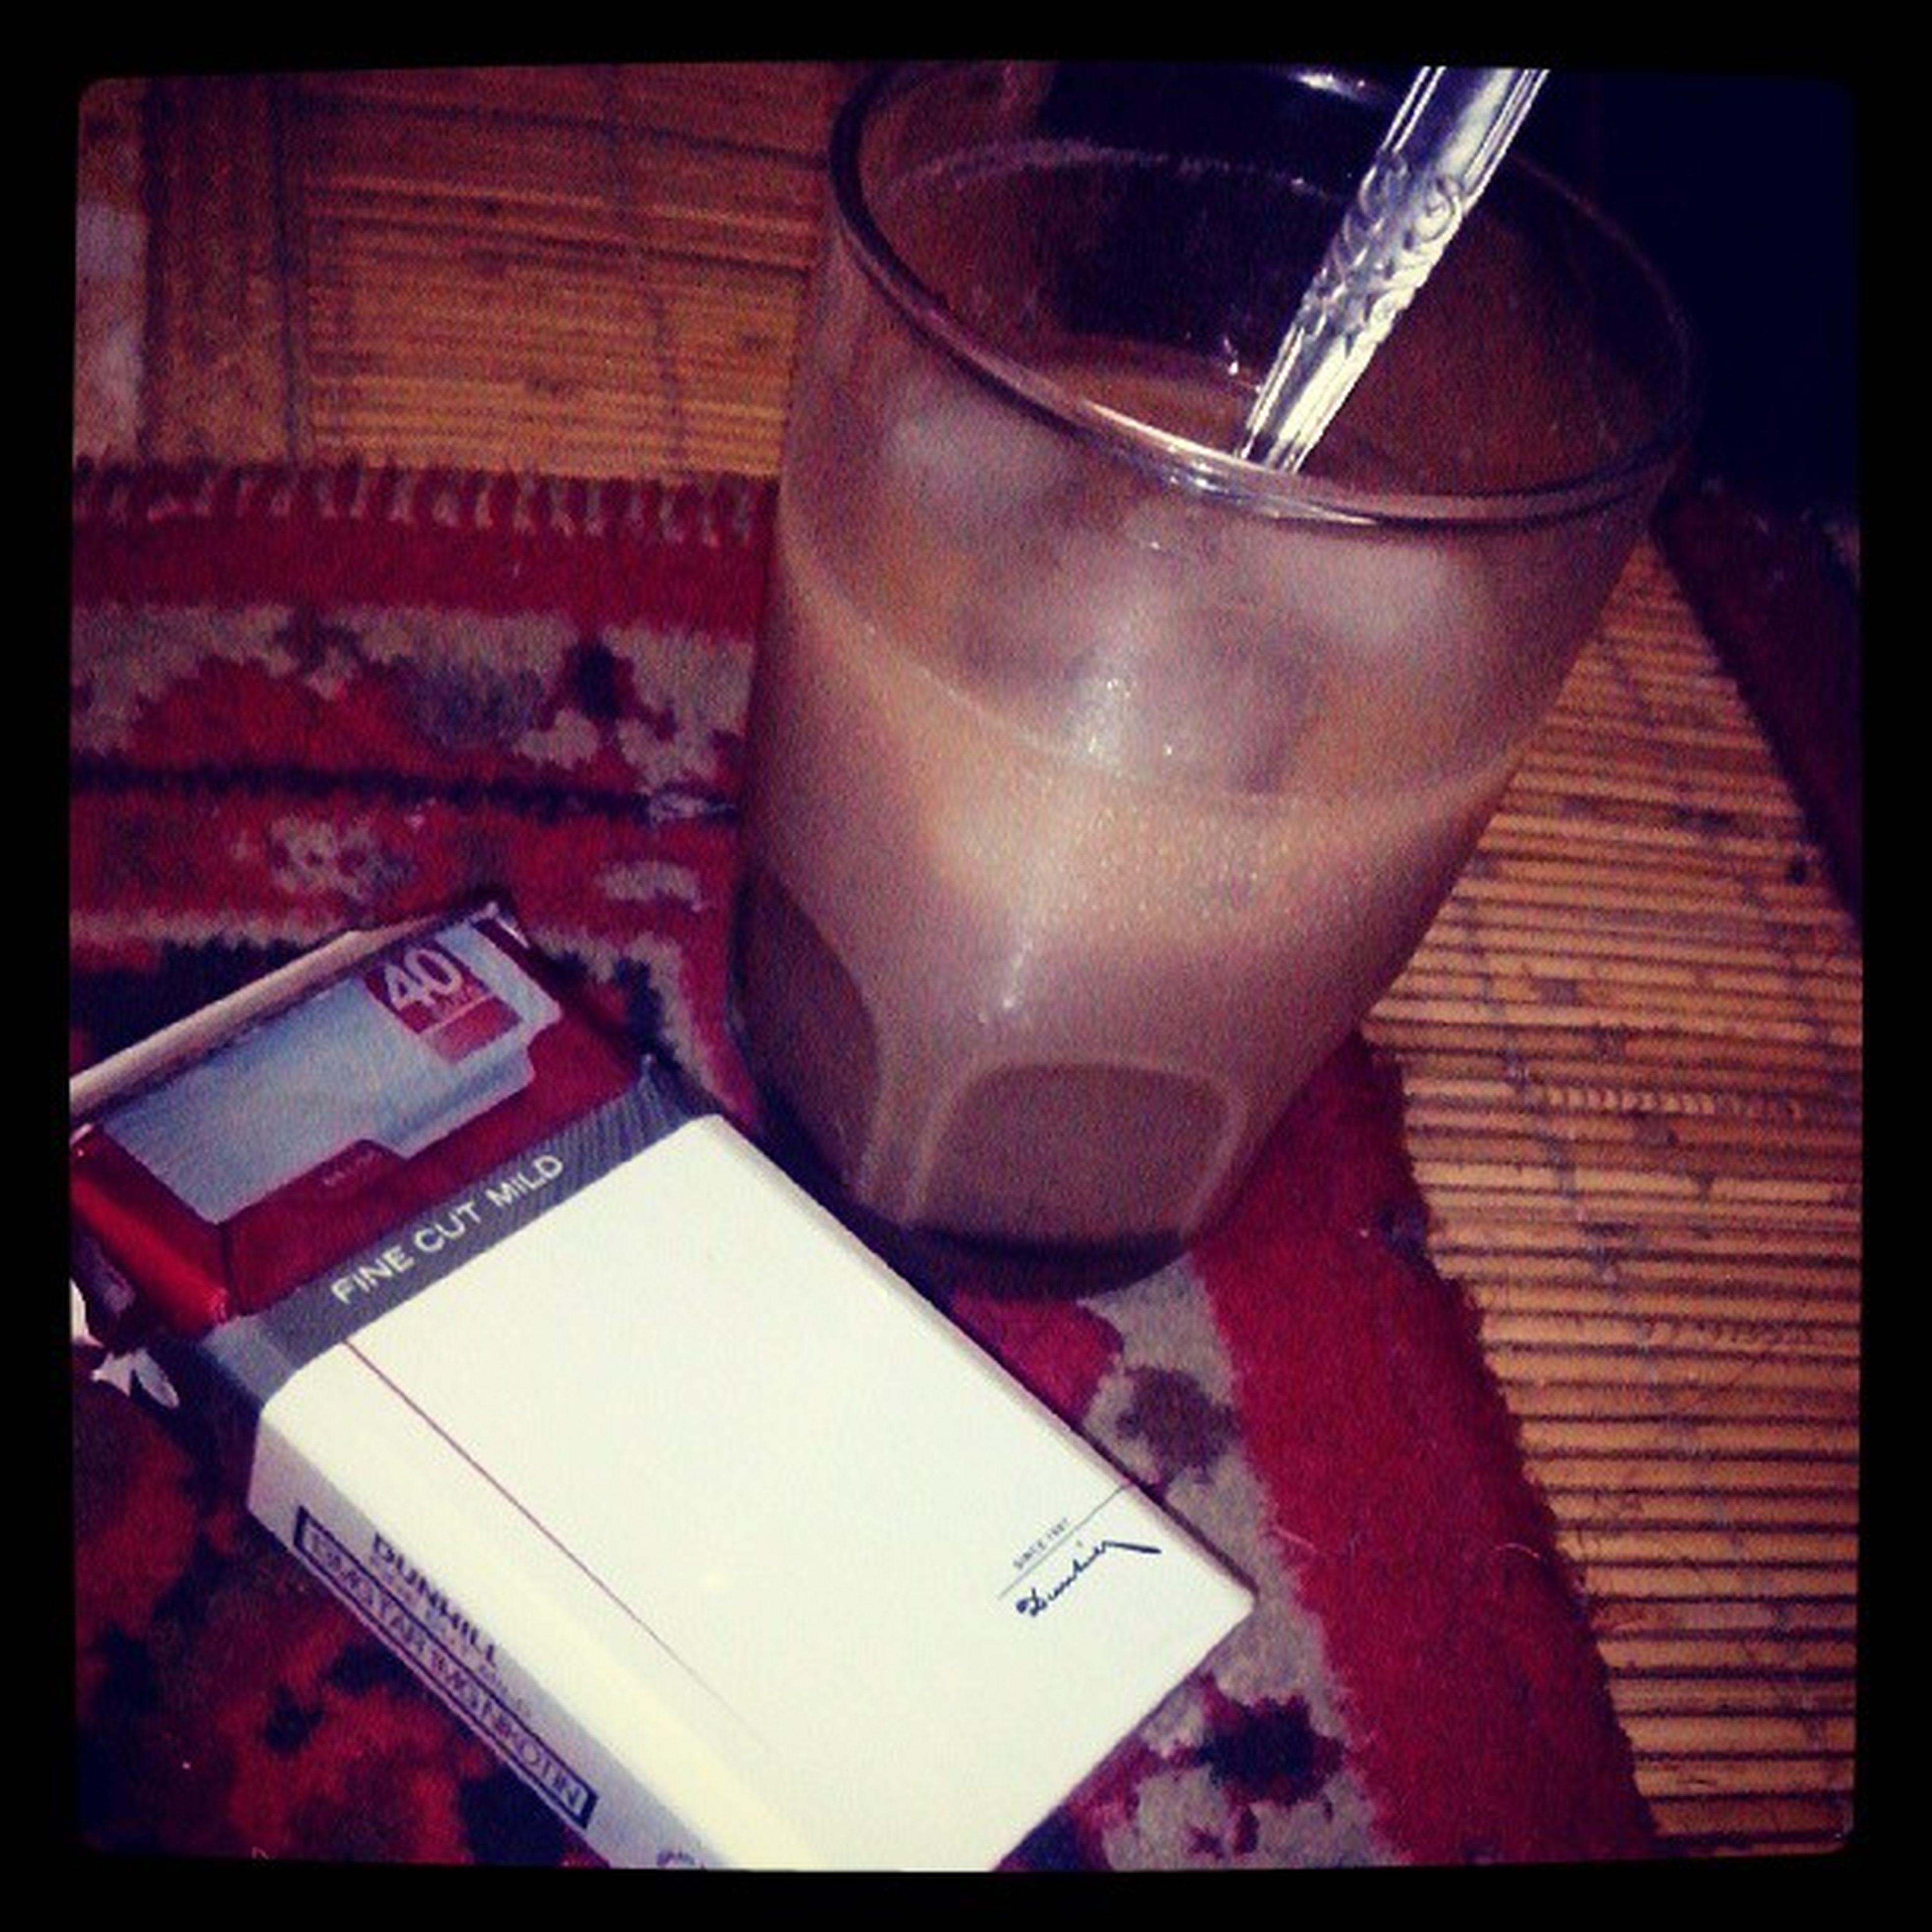 Berbuka dengan nikotin dan kafein. Dunhillmild Icedmocachinno Caffein Nicotine cigarette coffee